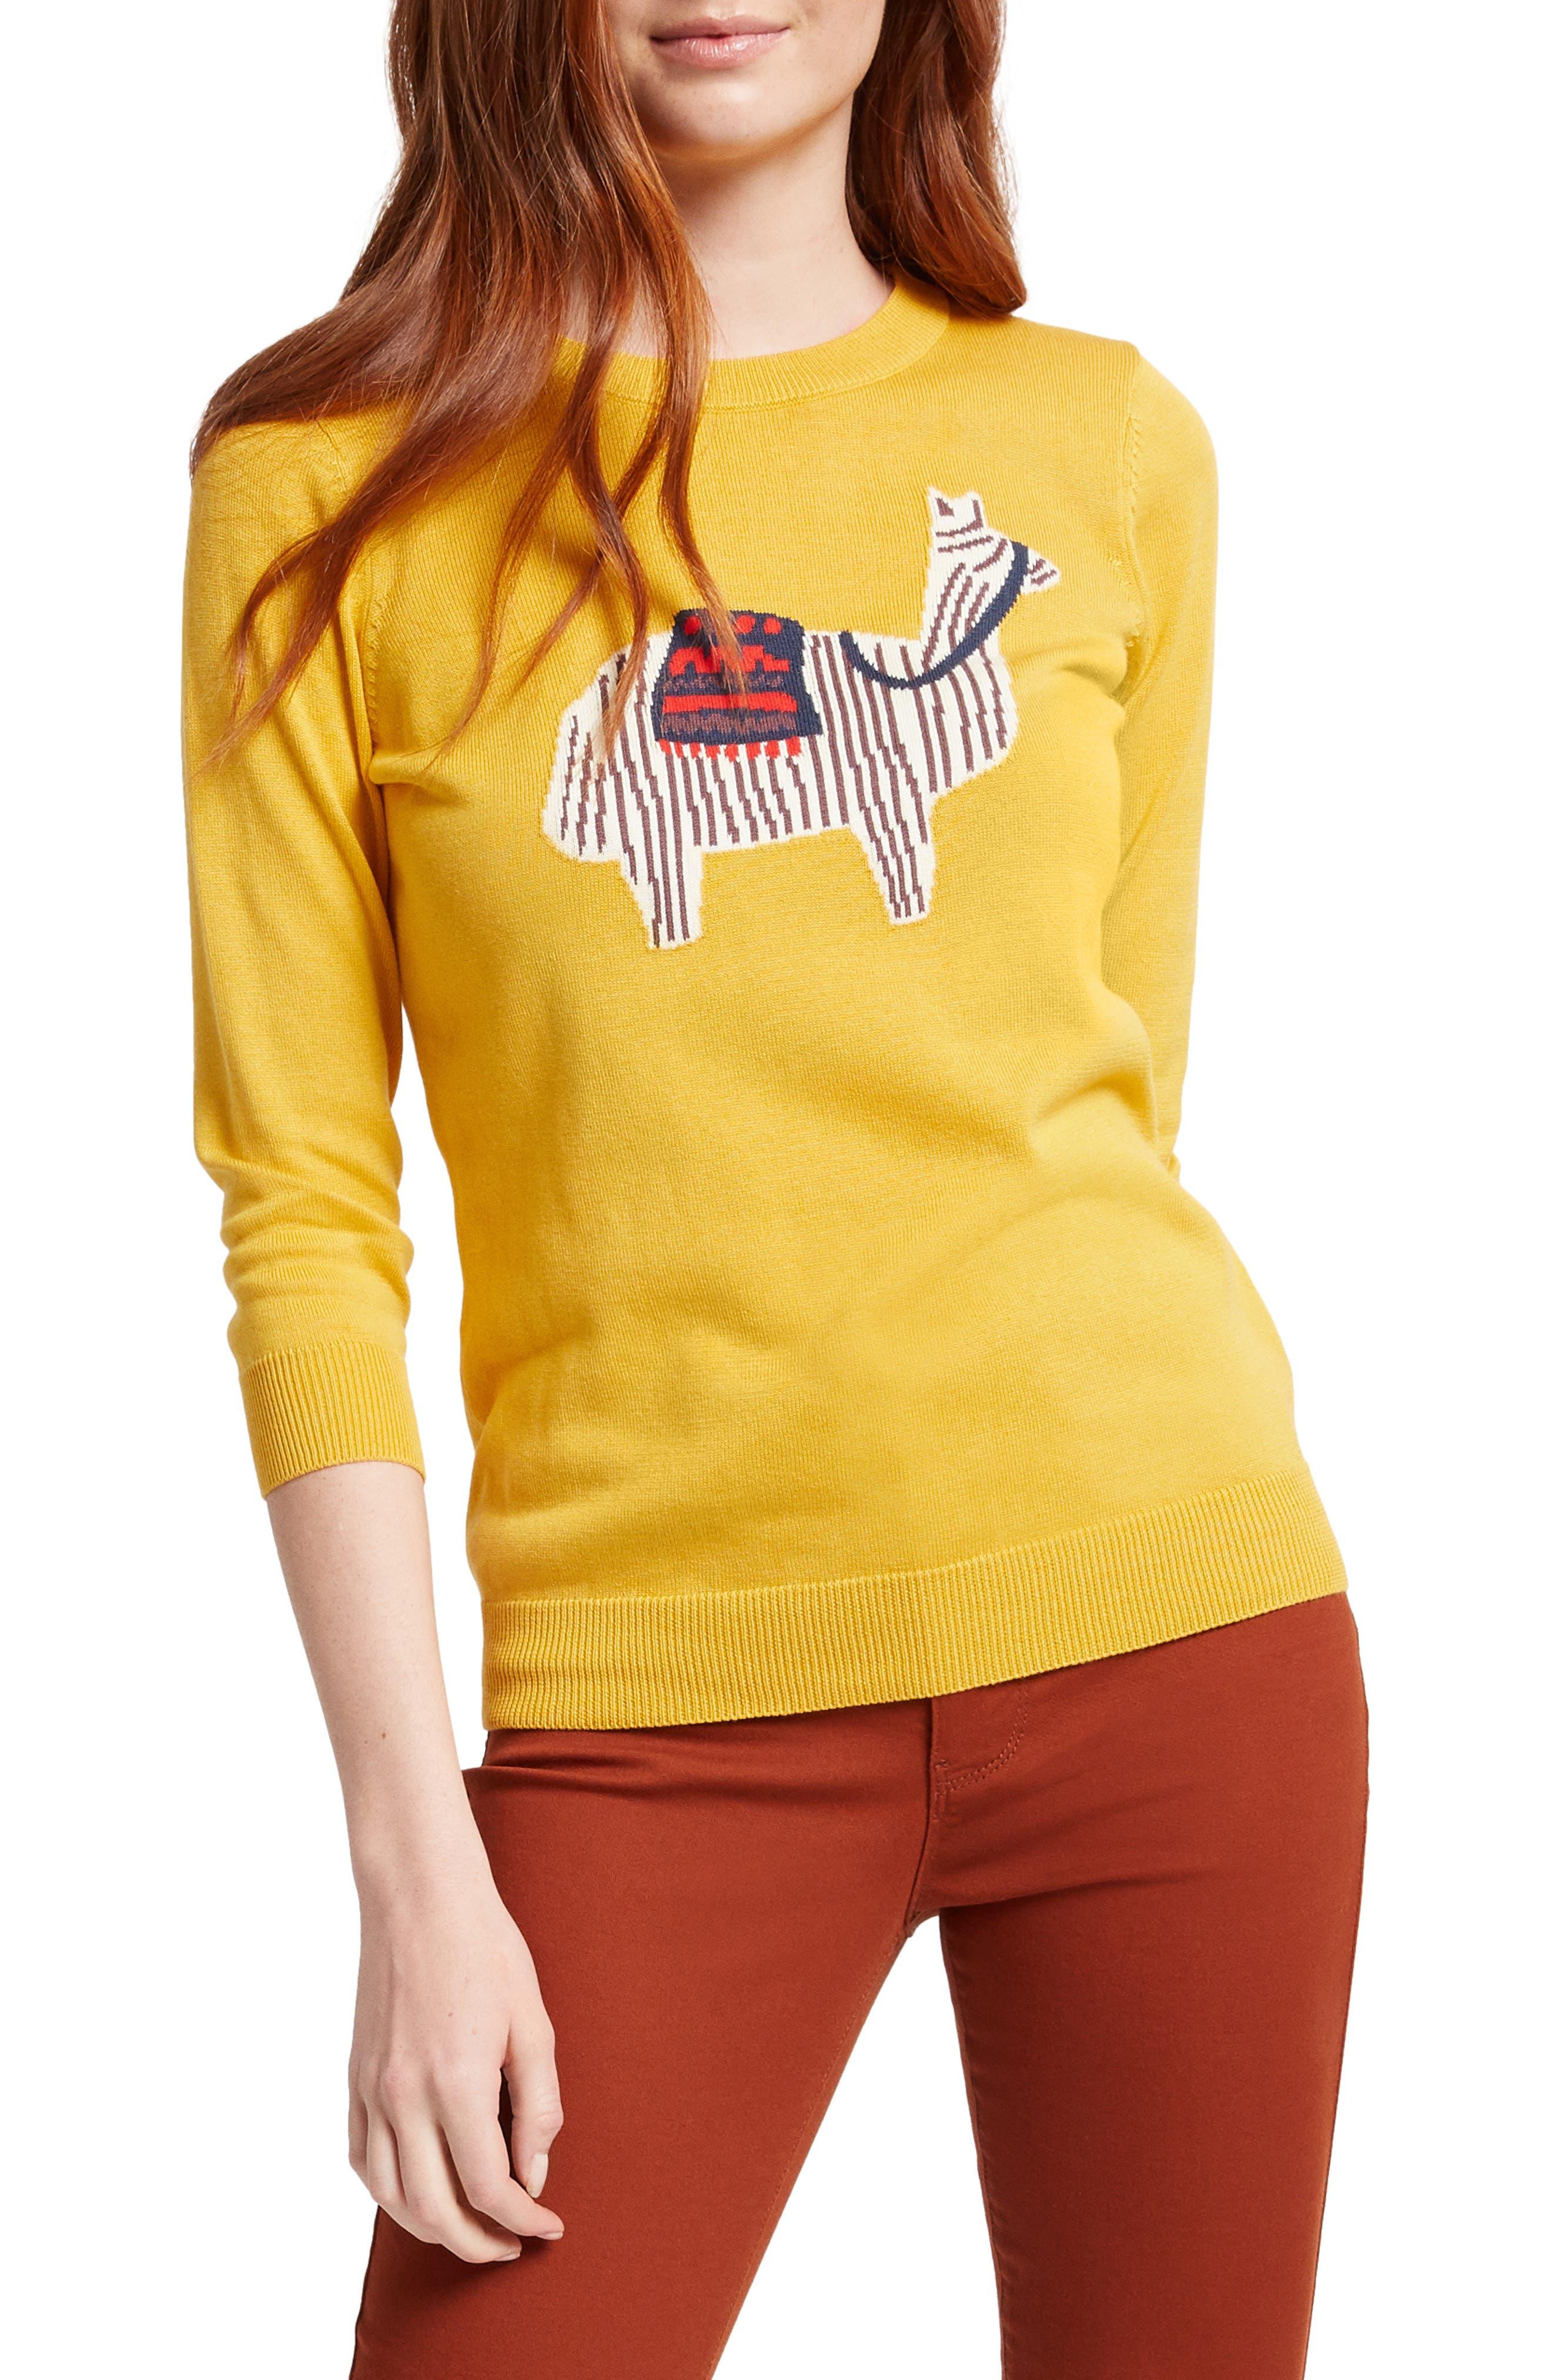 Plus Size Modcloth Llama Intarsia Sweater, Yellow